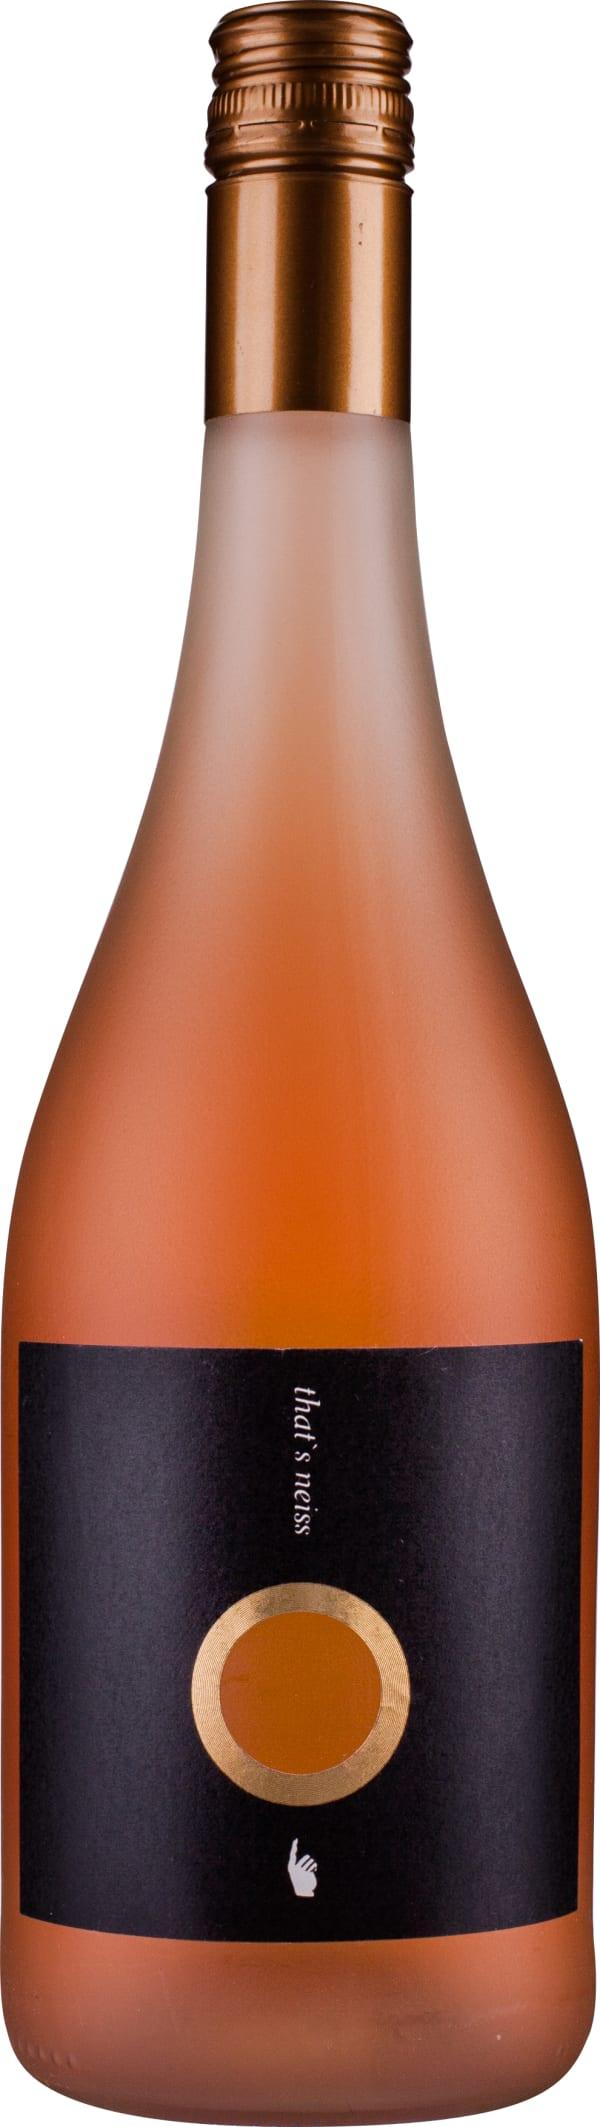 That's Neiss Pinot Noir Rosé Trocken 2017